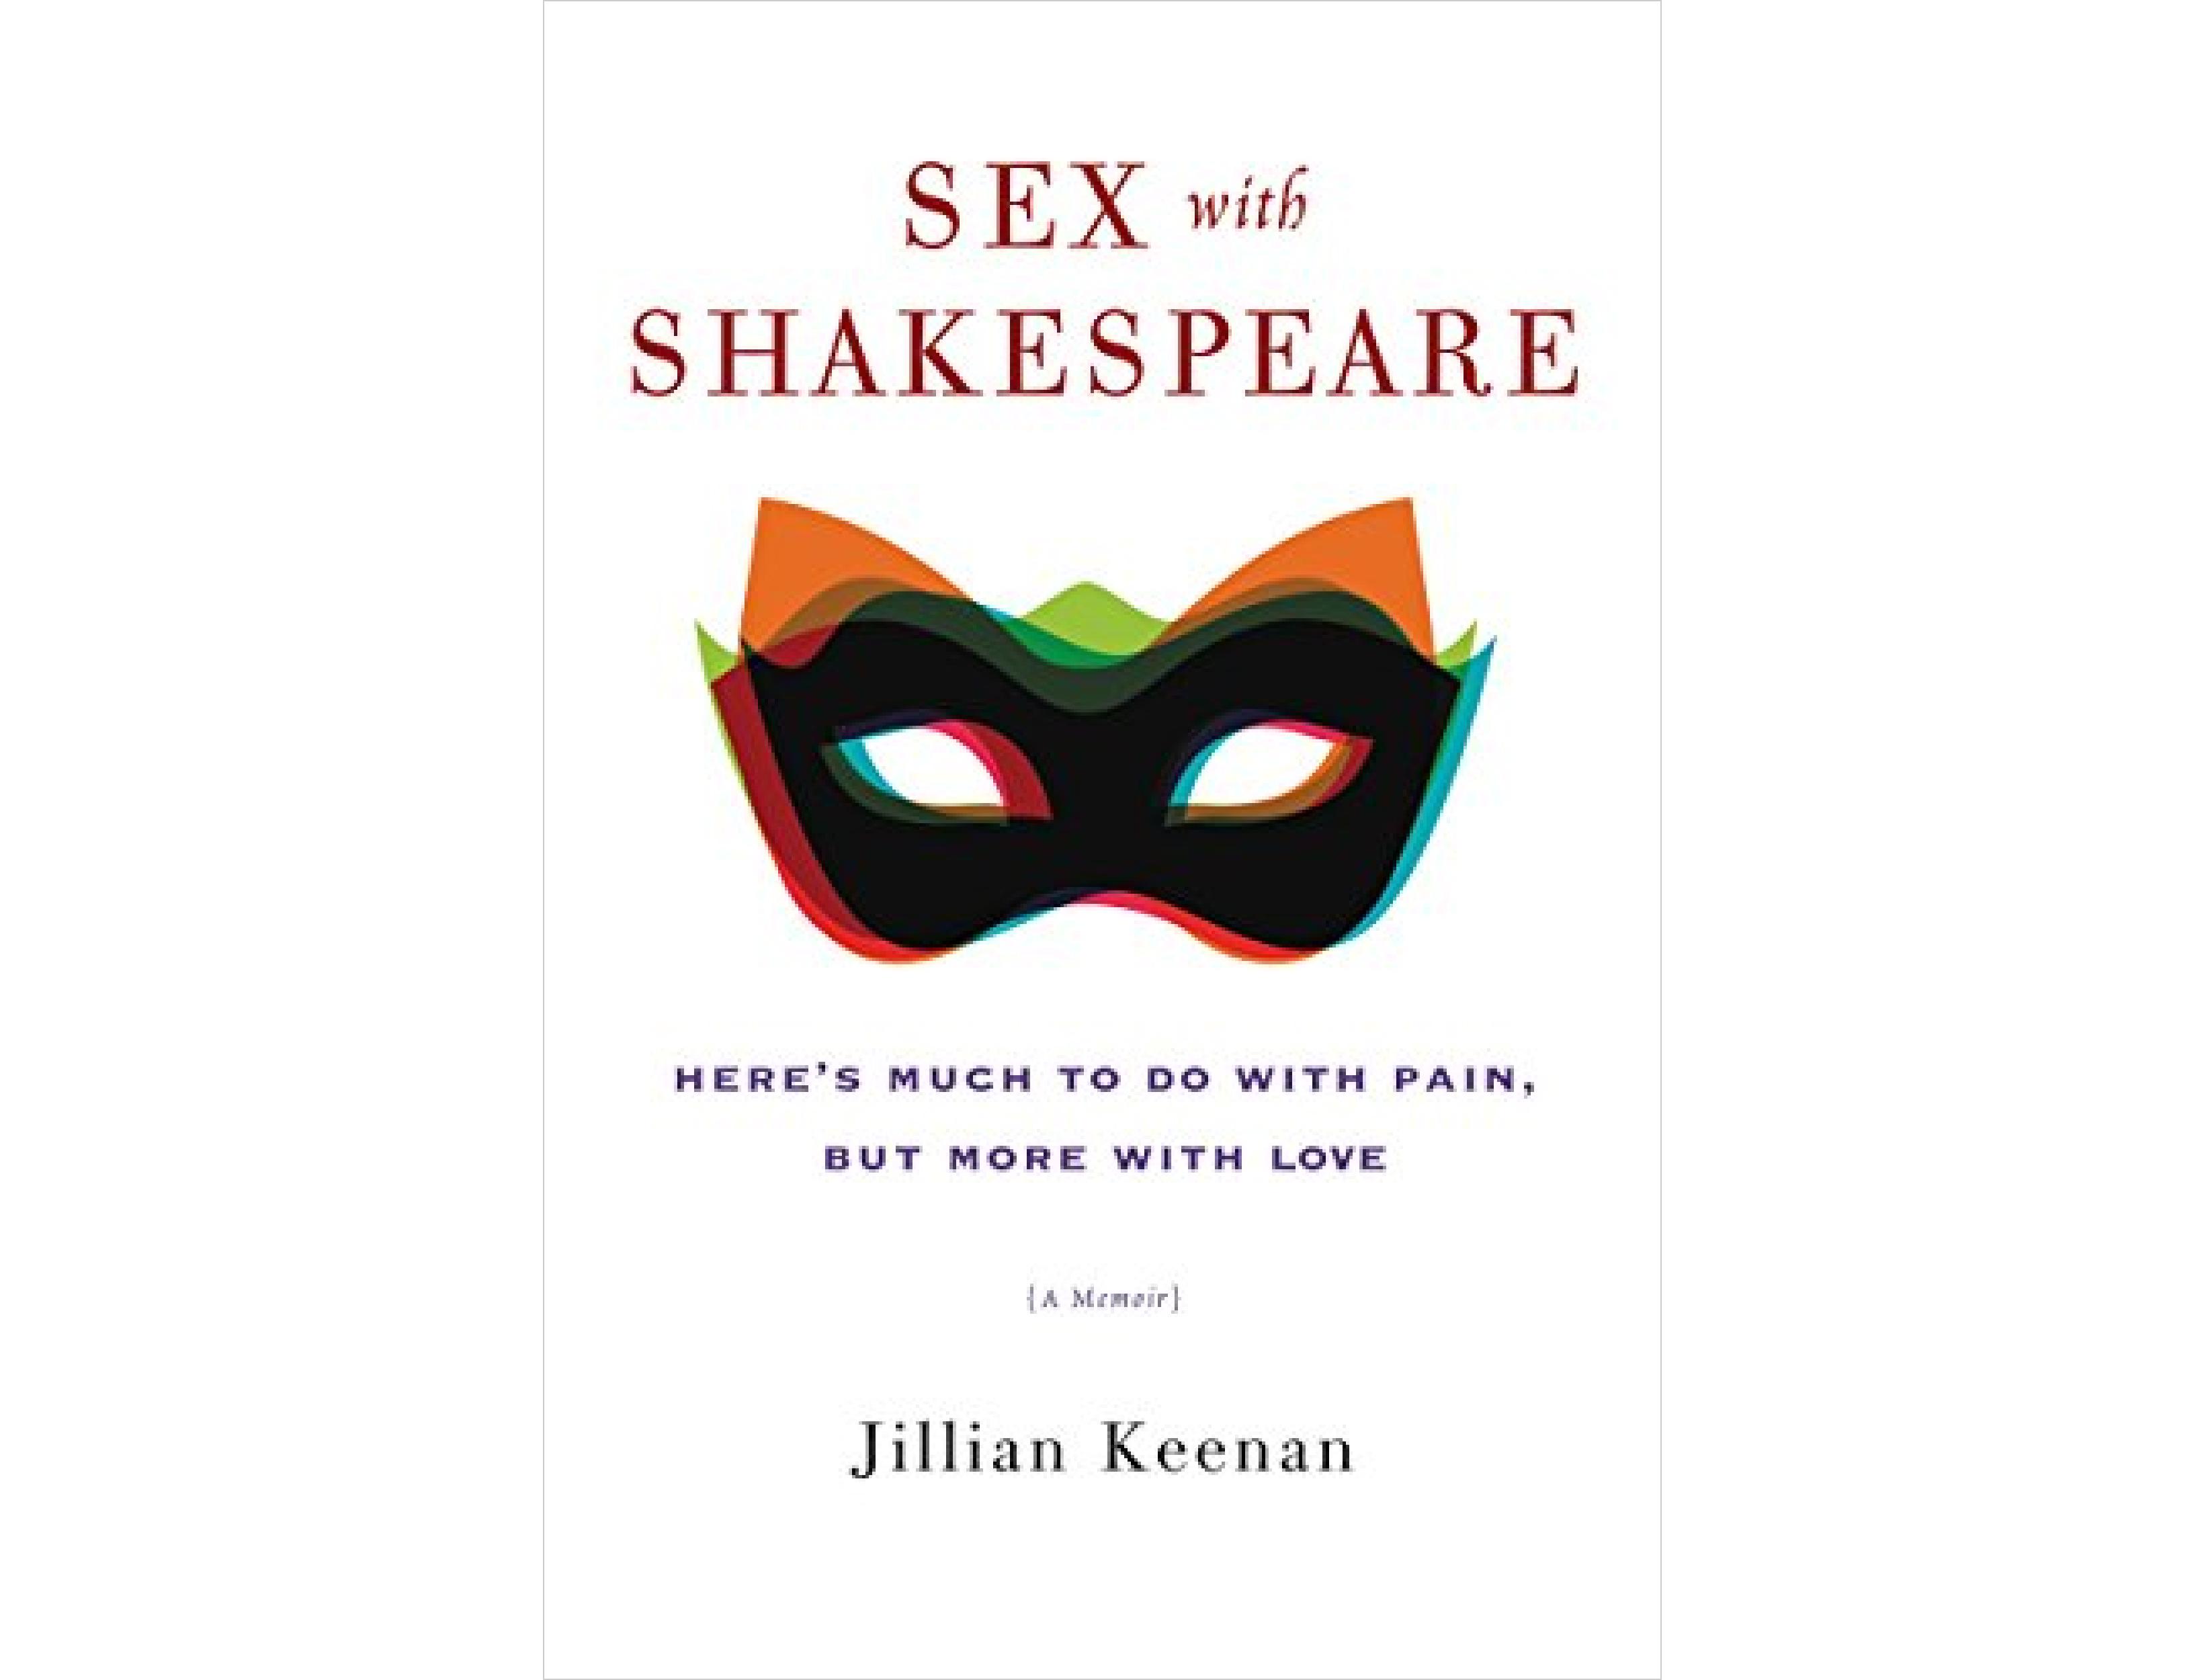 <em>Sex with Shakespeare</em> by Jillian Keenan